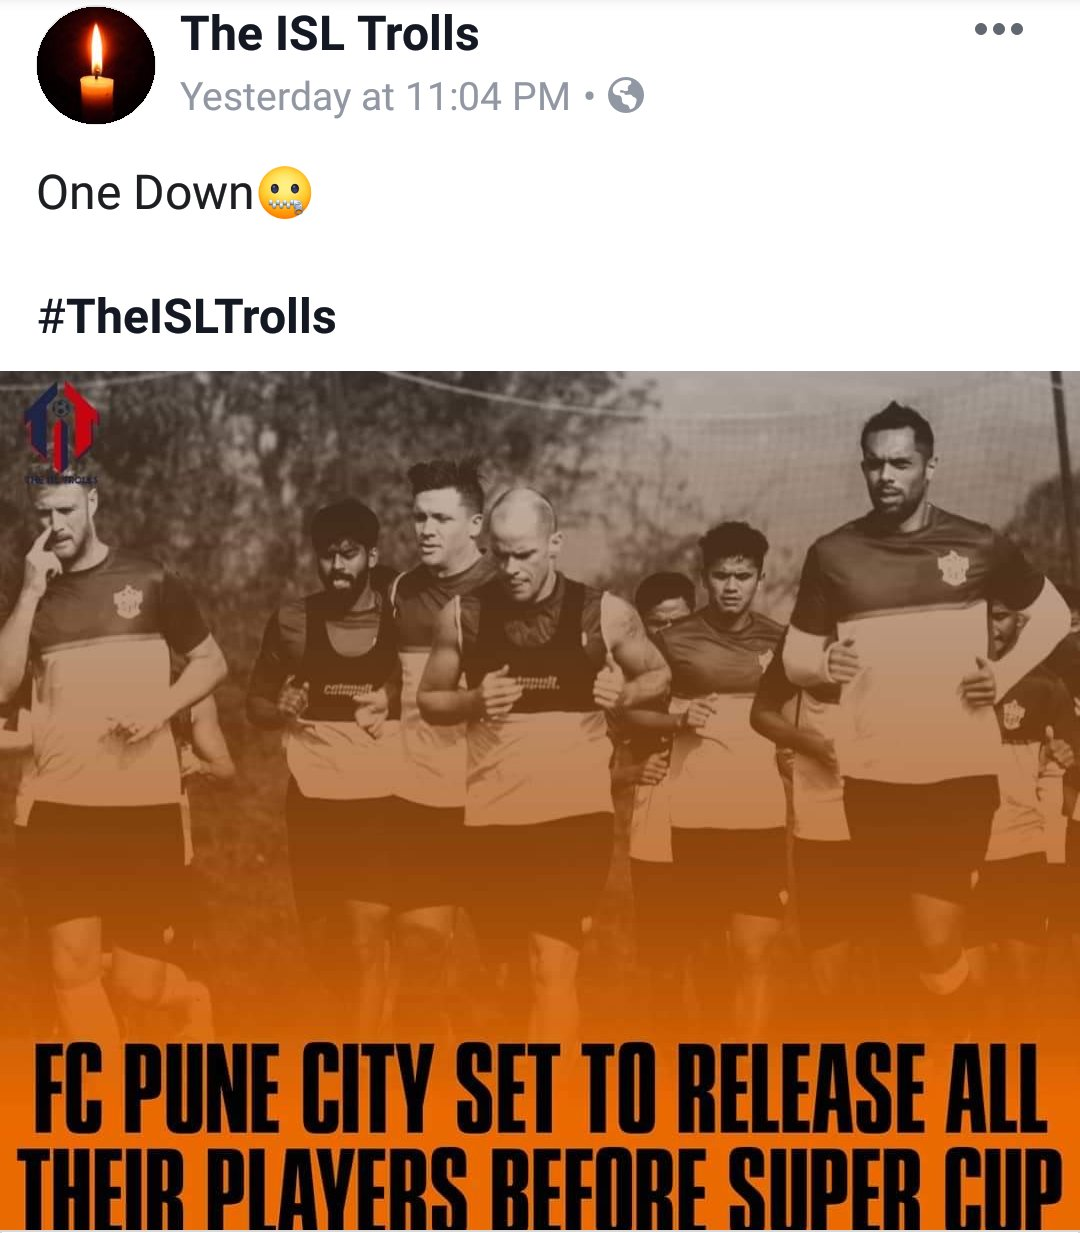 FC Pune City makes a Big Statement about the club's immediate future screenshot 20190304 09174125764059601342888750.